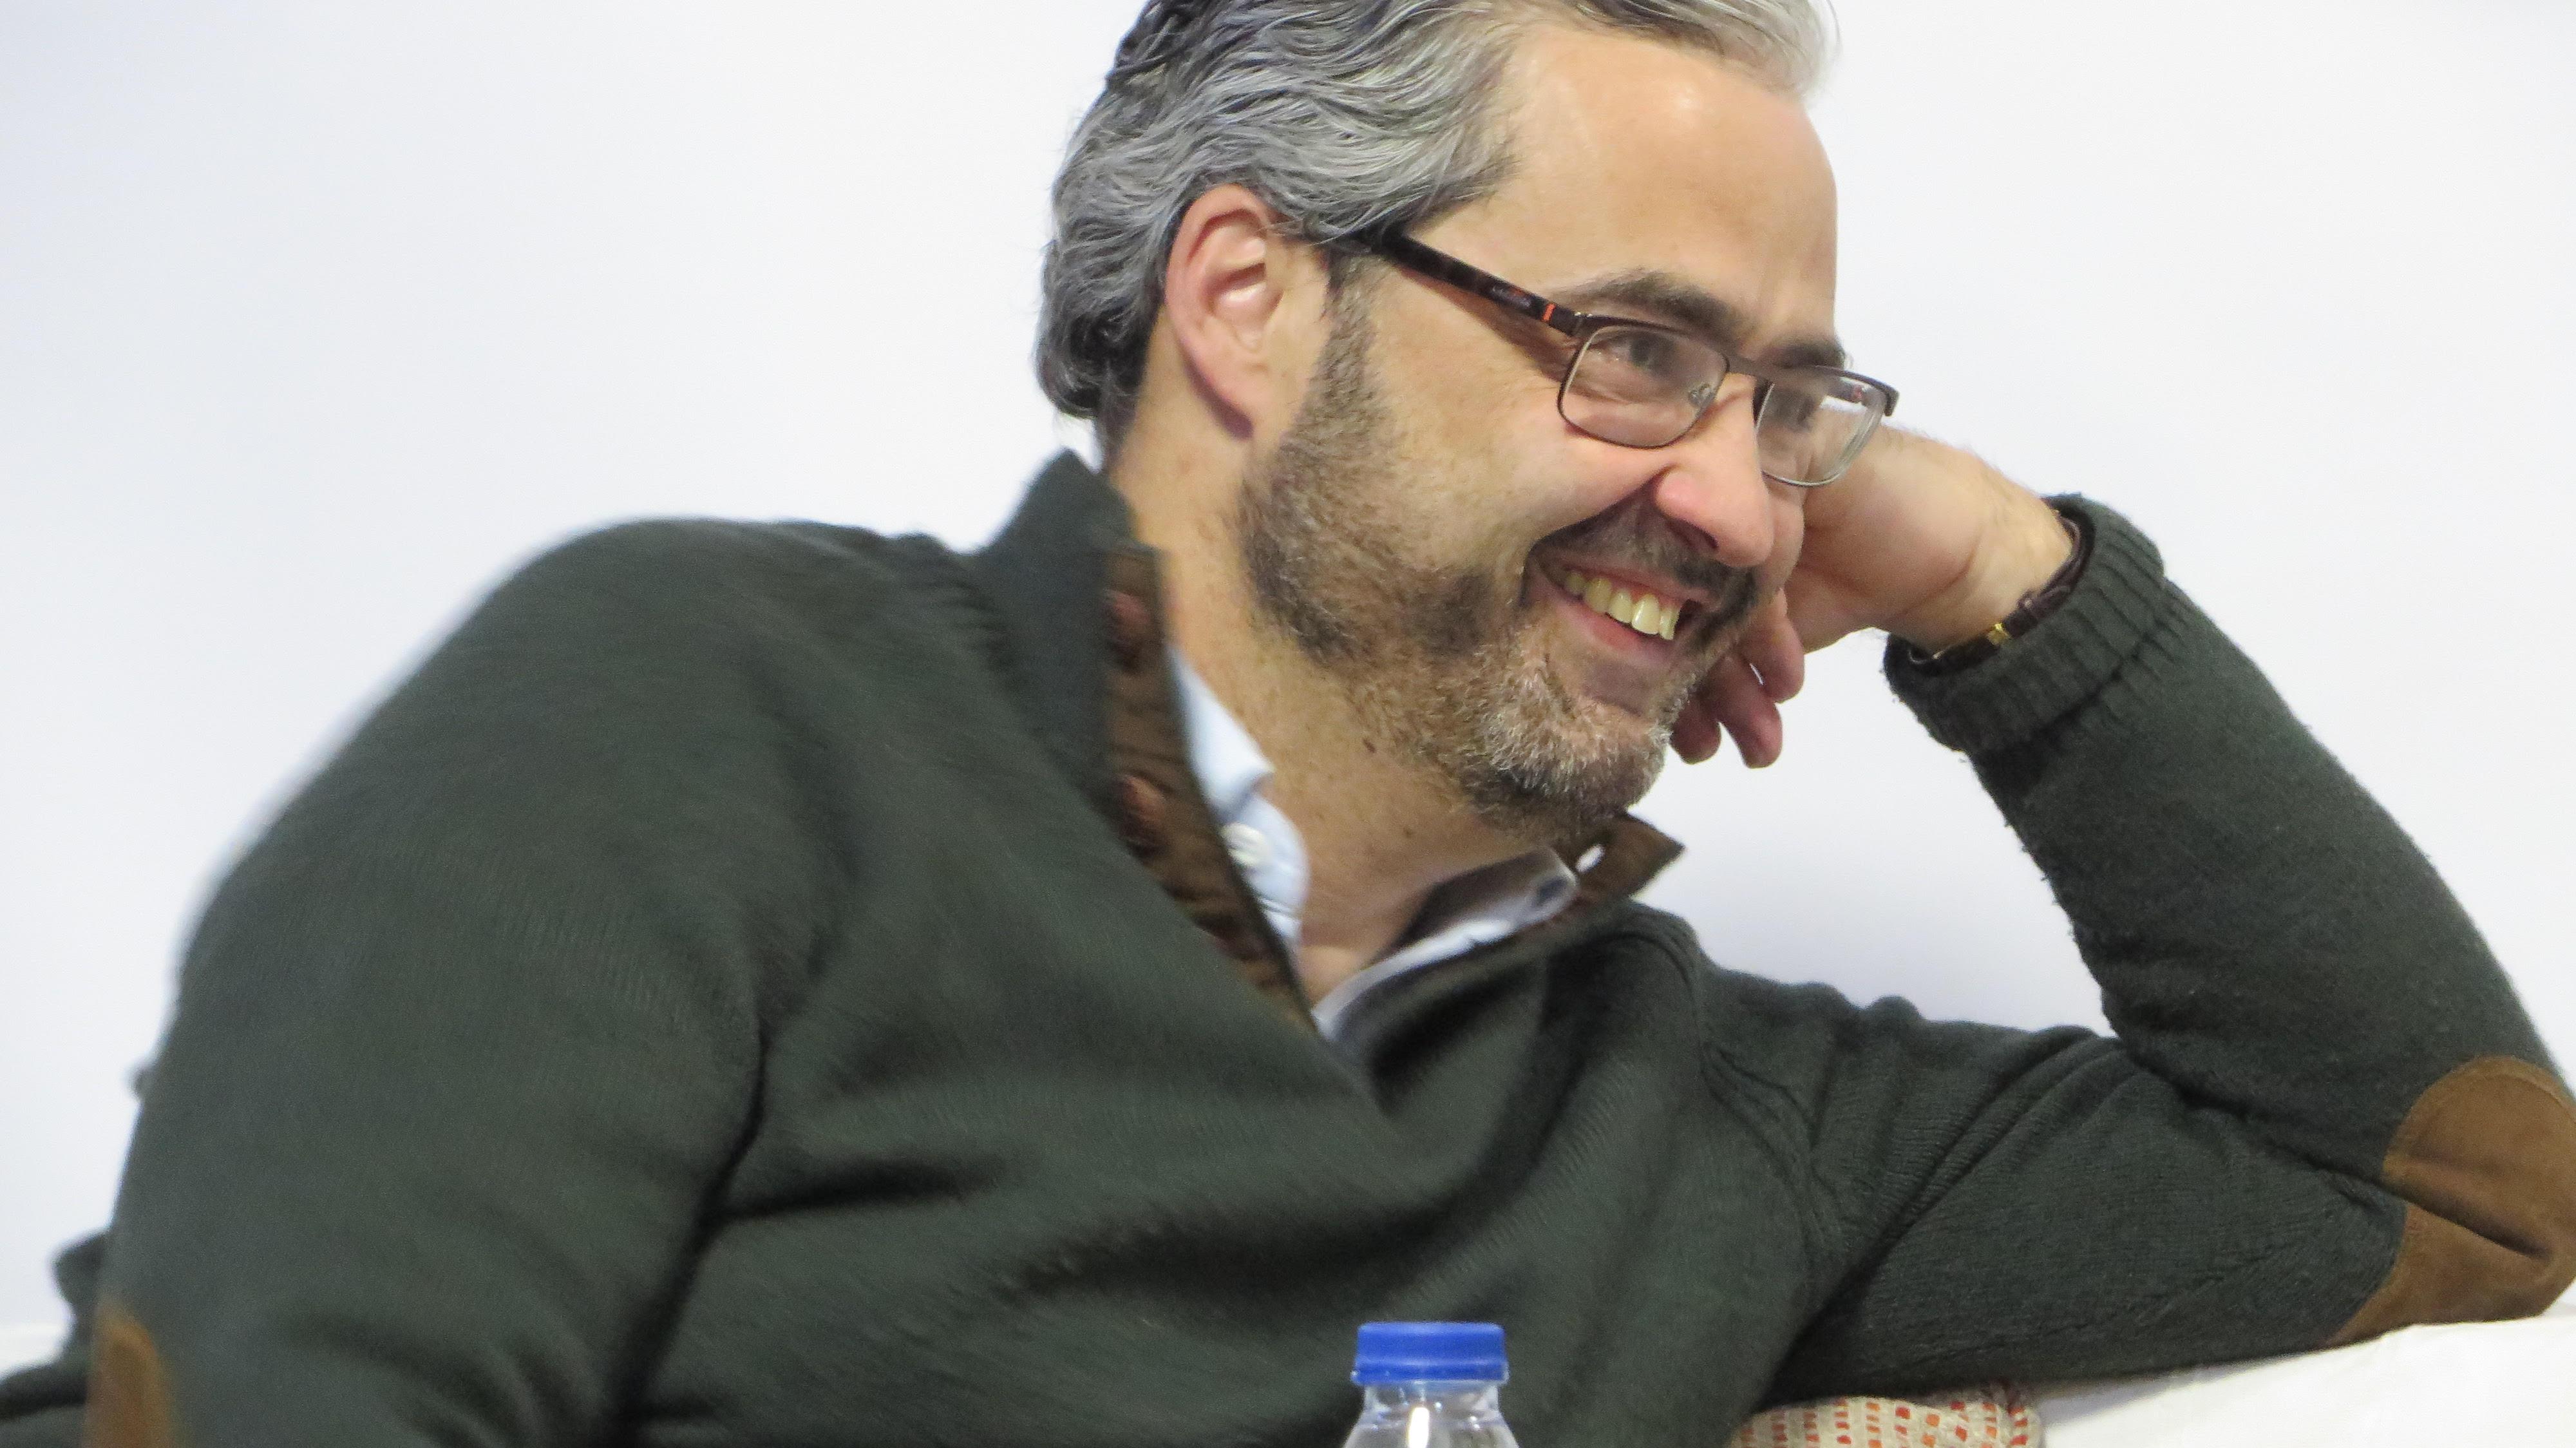 Pavel Gómez del Castillo